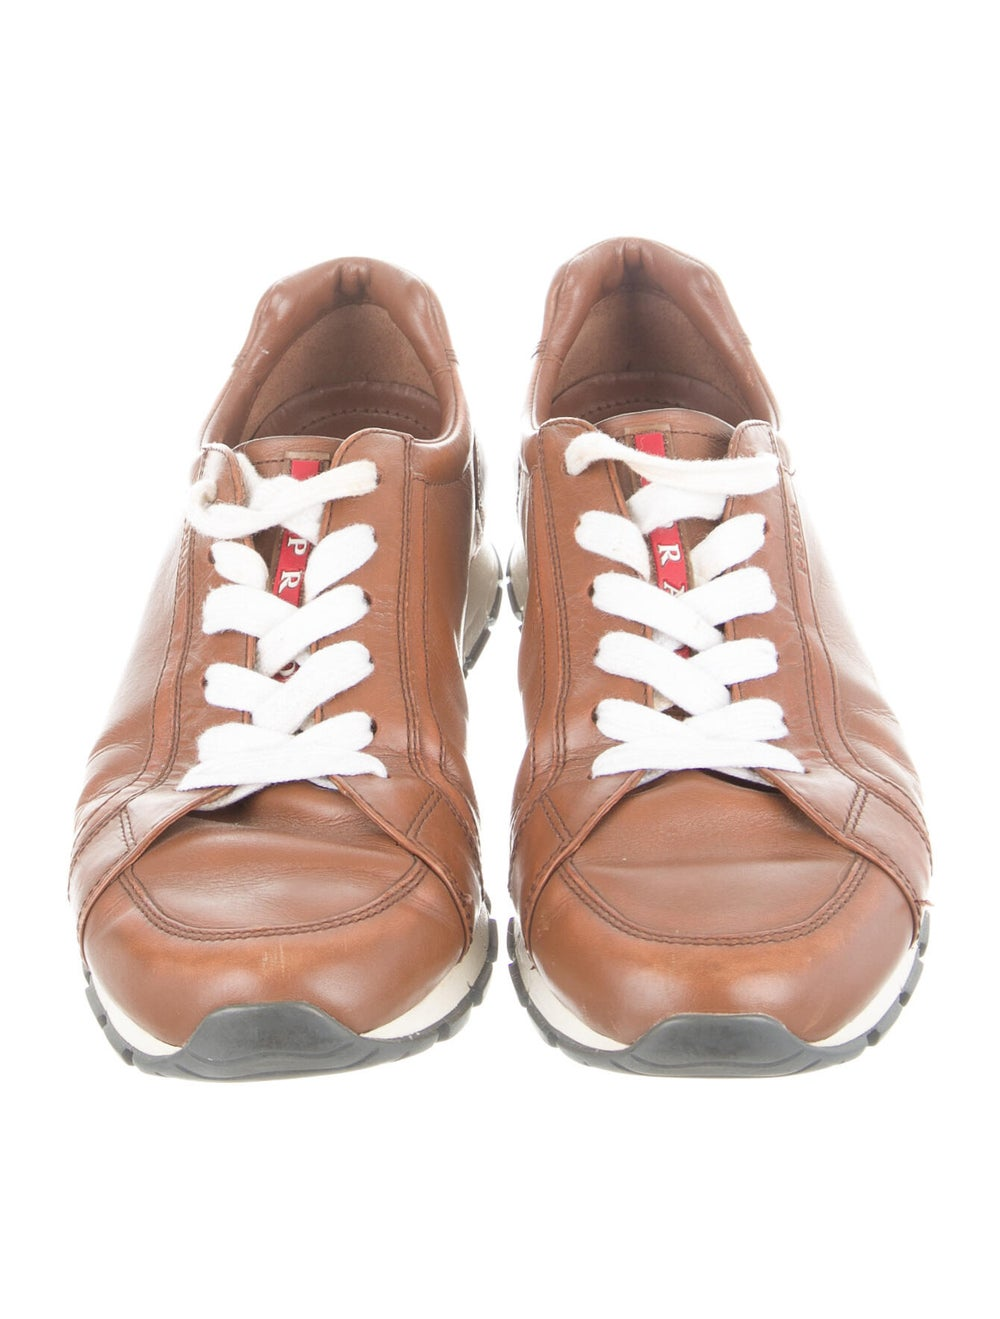 Prada Sport Leather Sneakers Brown - image 3